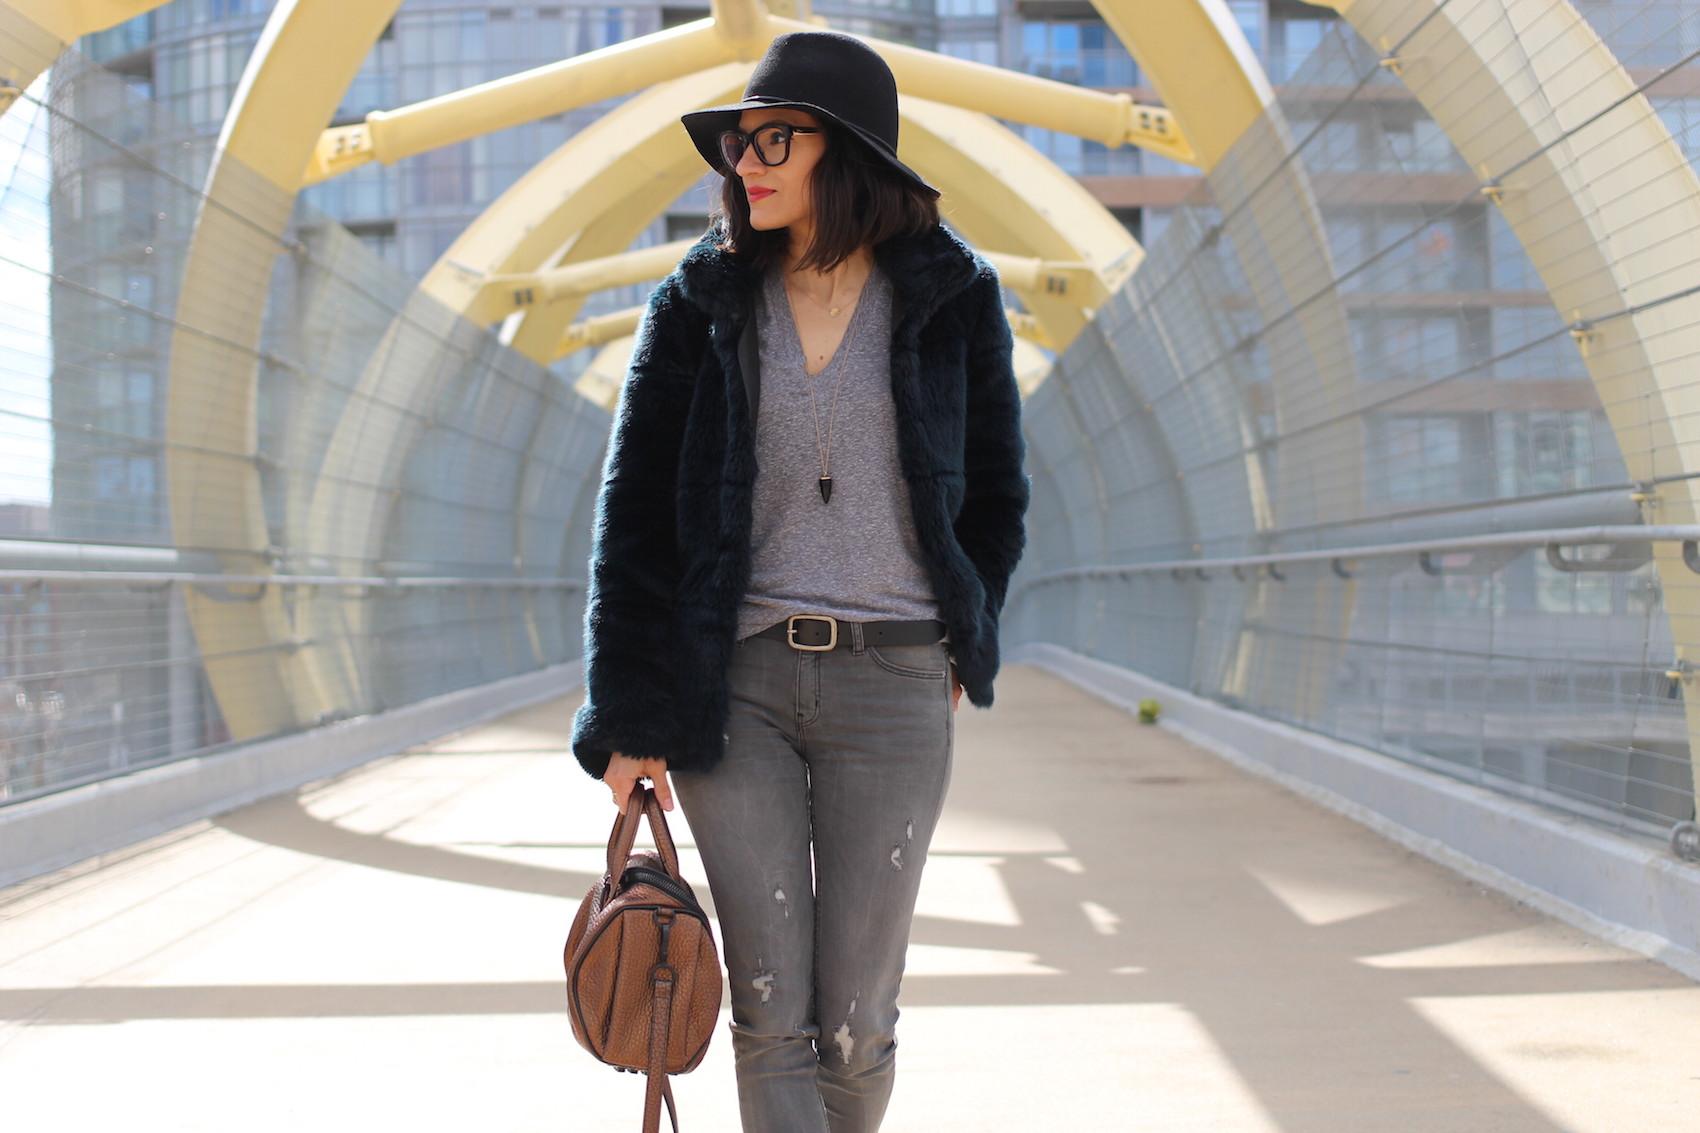 WoahStyle.com | Casual Wear with Alexander Wang Rockie and Zara faux fur coat. Street style.